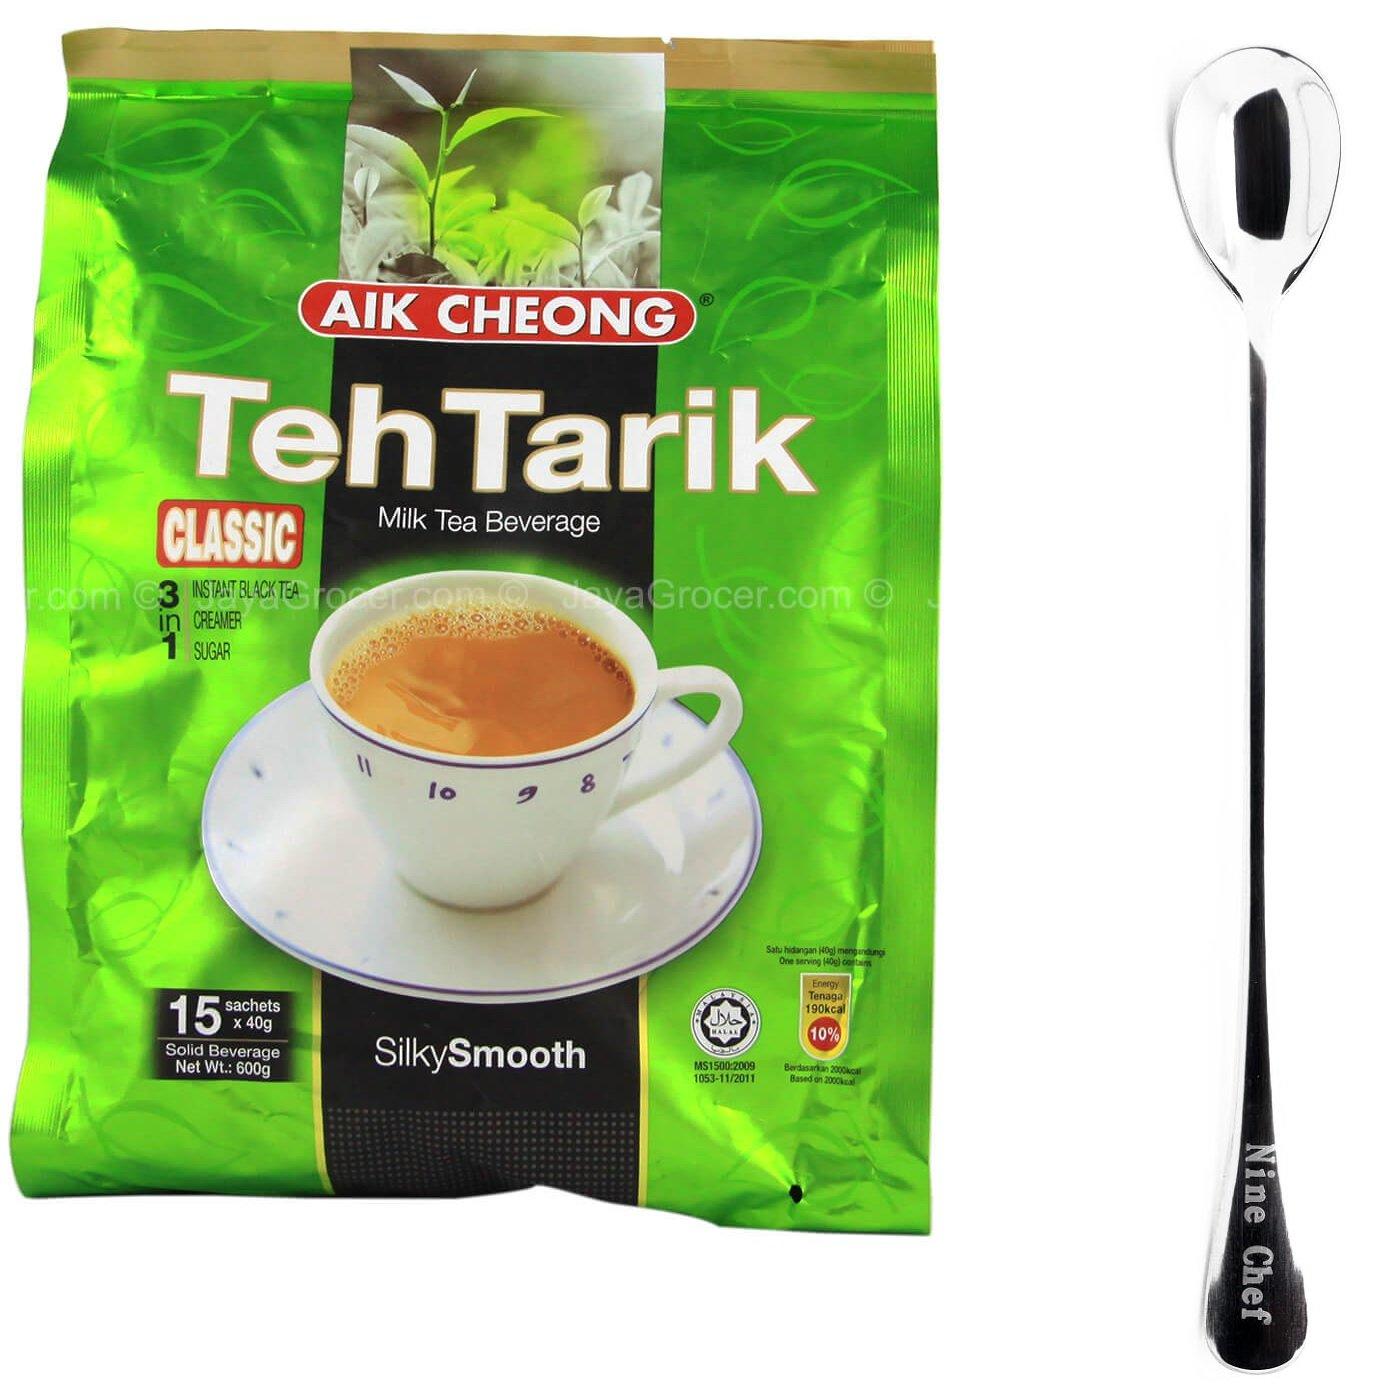 Aik Cheong Classic 3in1 Teh Tarik Milk Tea Beverage (6 Pack)+ one NineChef Spoon